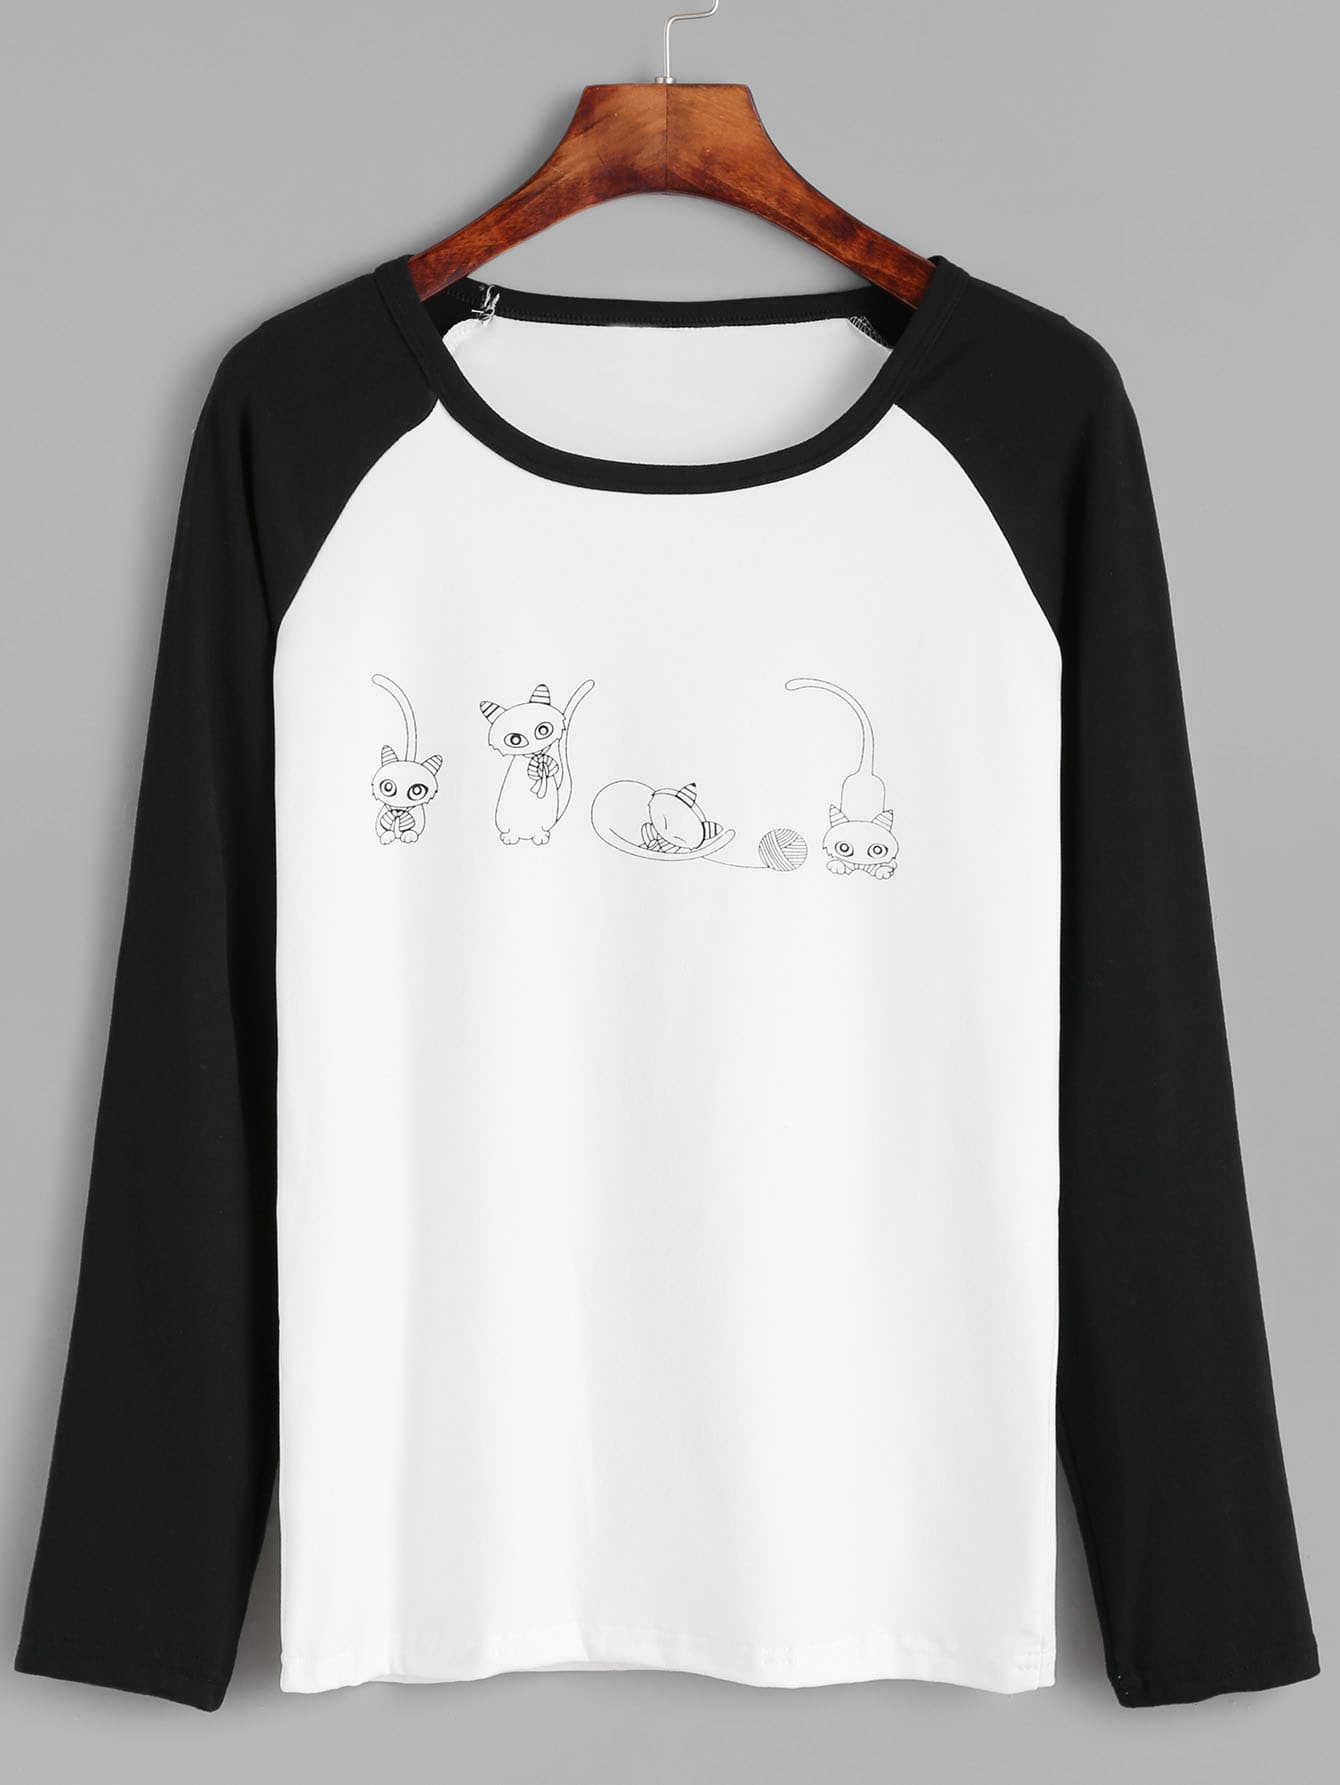 Contrast Raglan Sleeve Cats Print T-shirt tee161011101